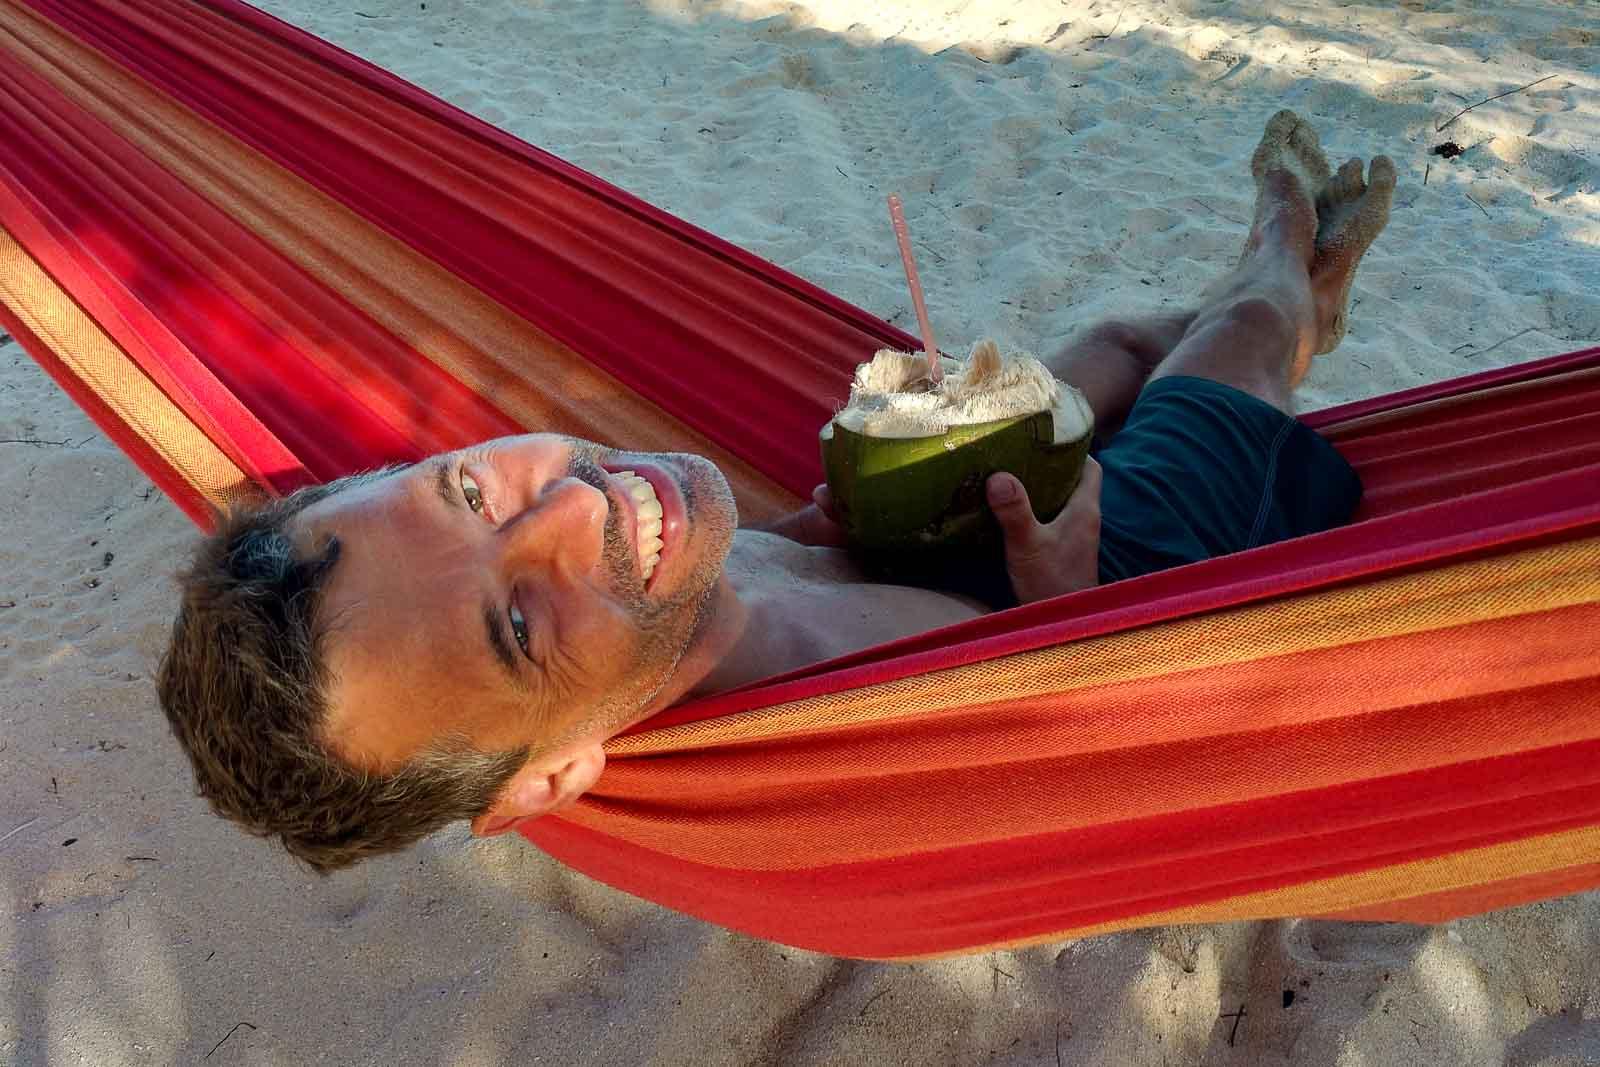 2bfree Copyright Mark Wistuba, Mexico, Mexiko, Playa Paraiso, Strand, Kokosnuss